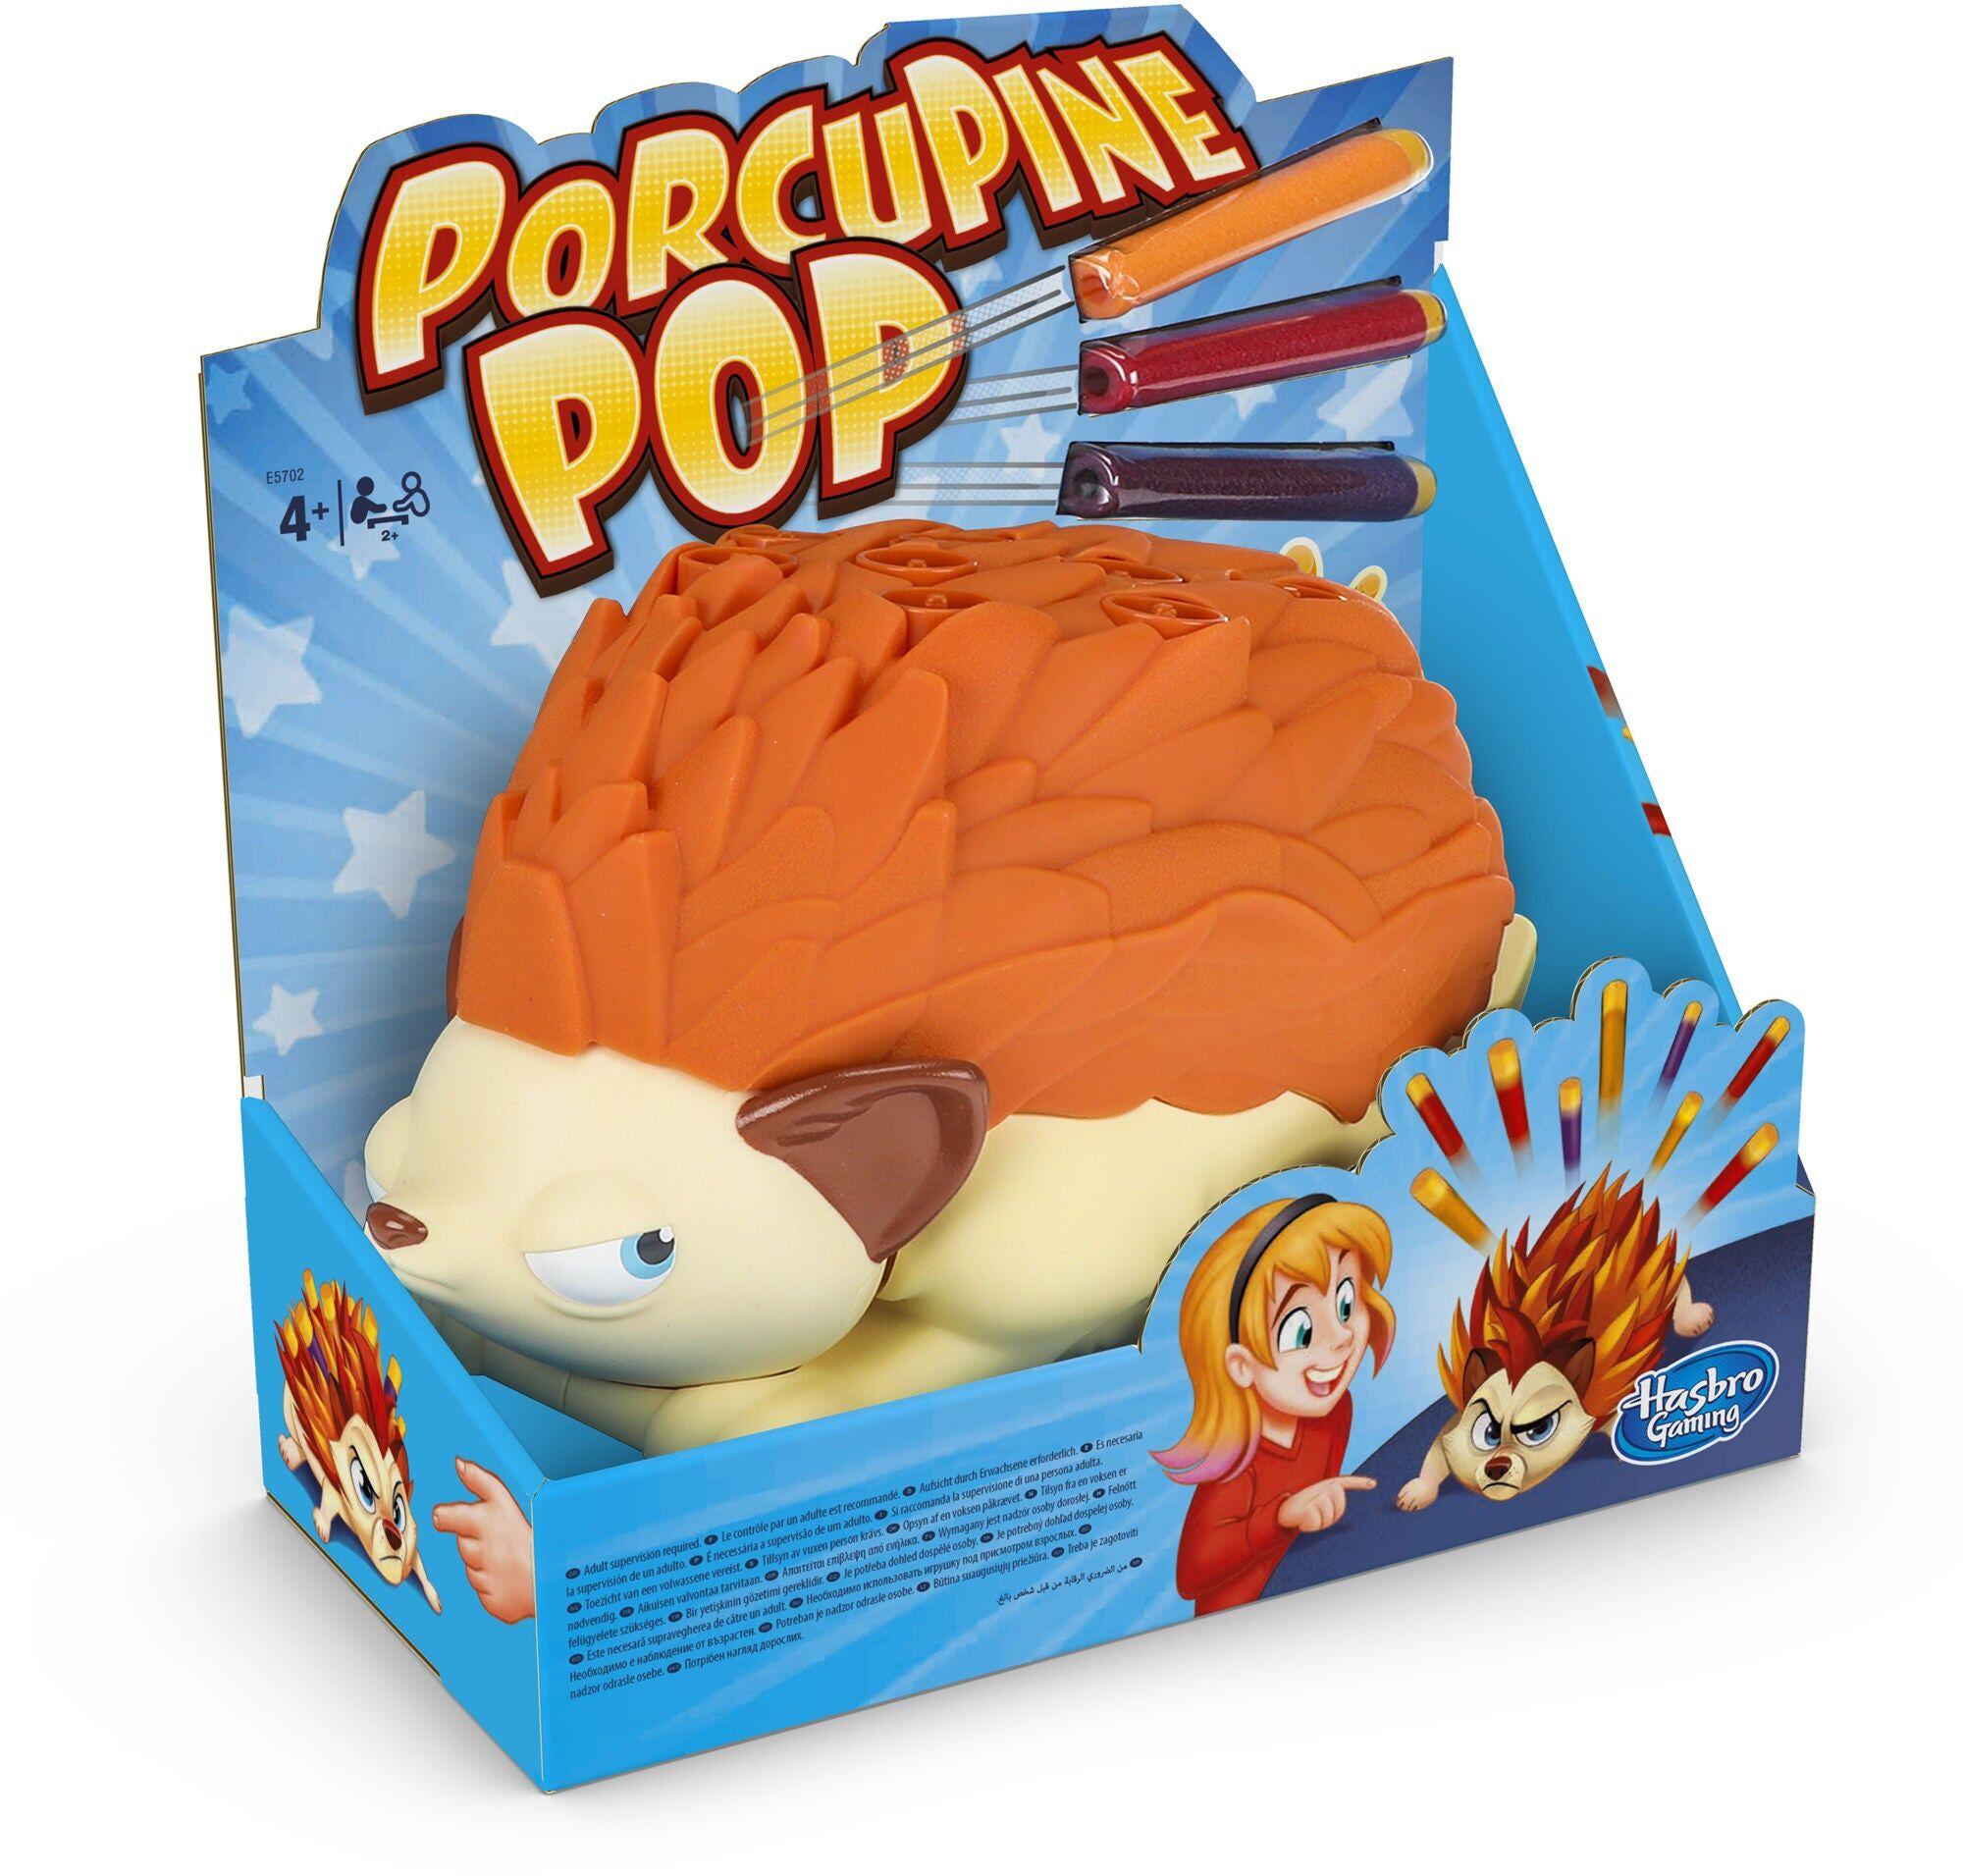 Hasbro Spill Porcupine Pop